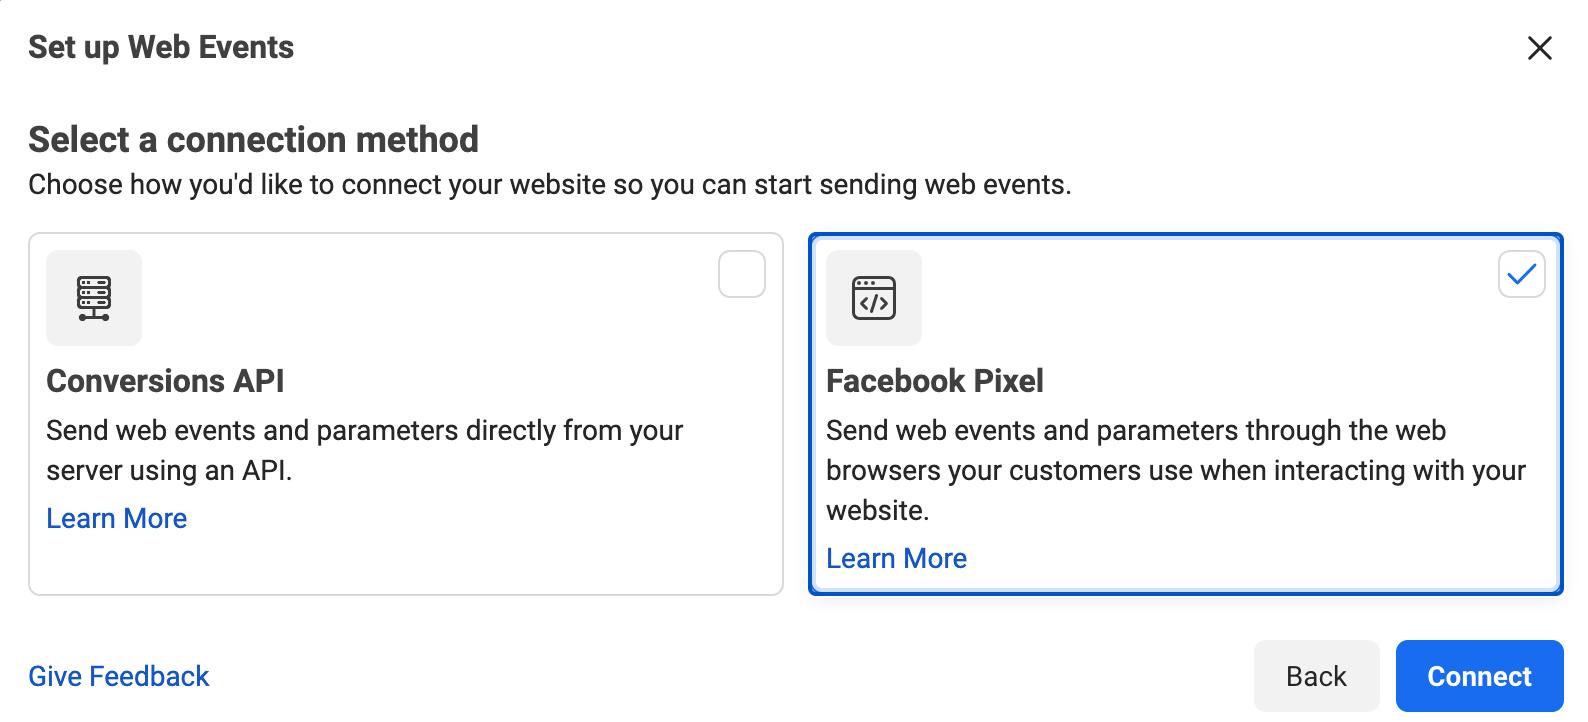 Chọn Facebook Pixel và click Connect